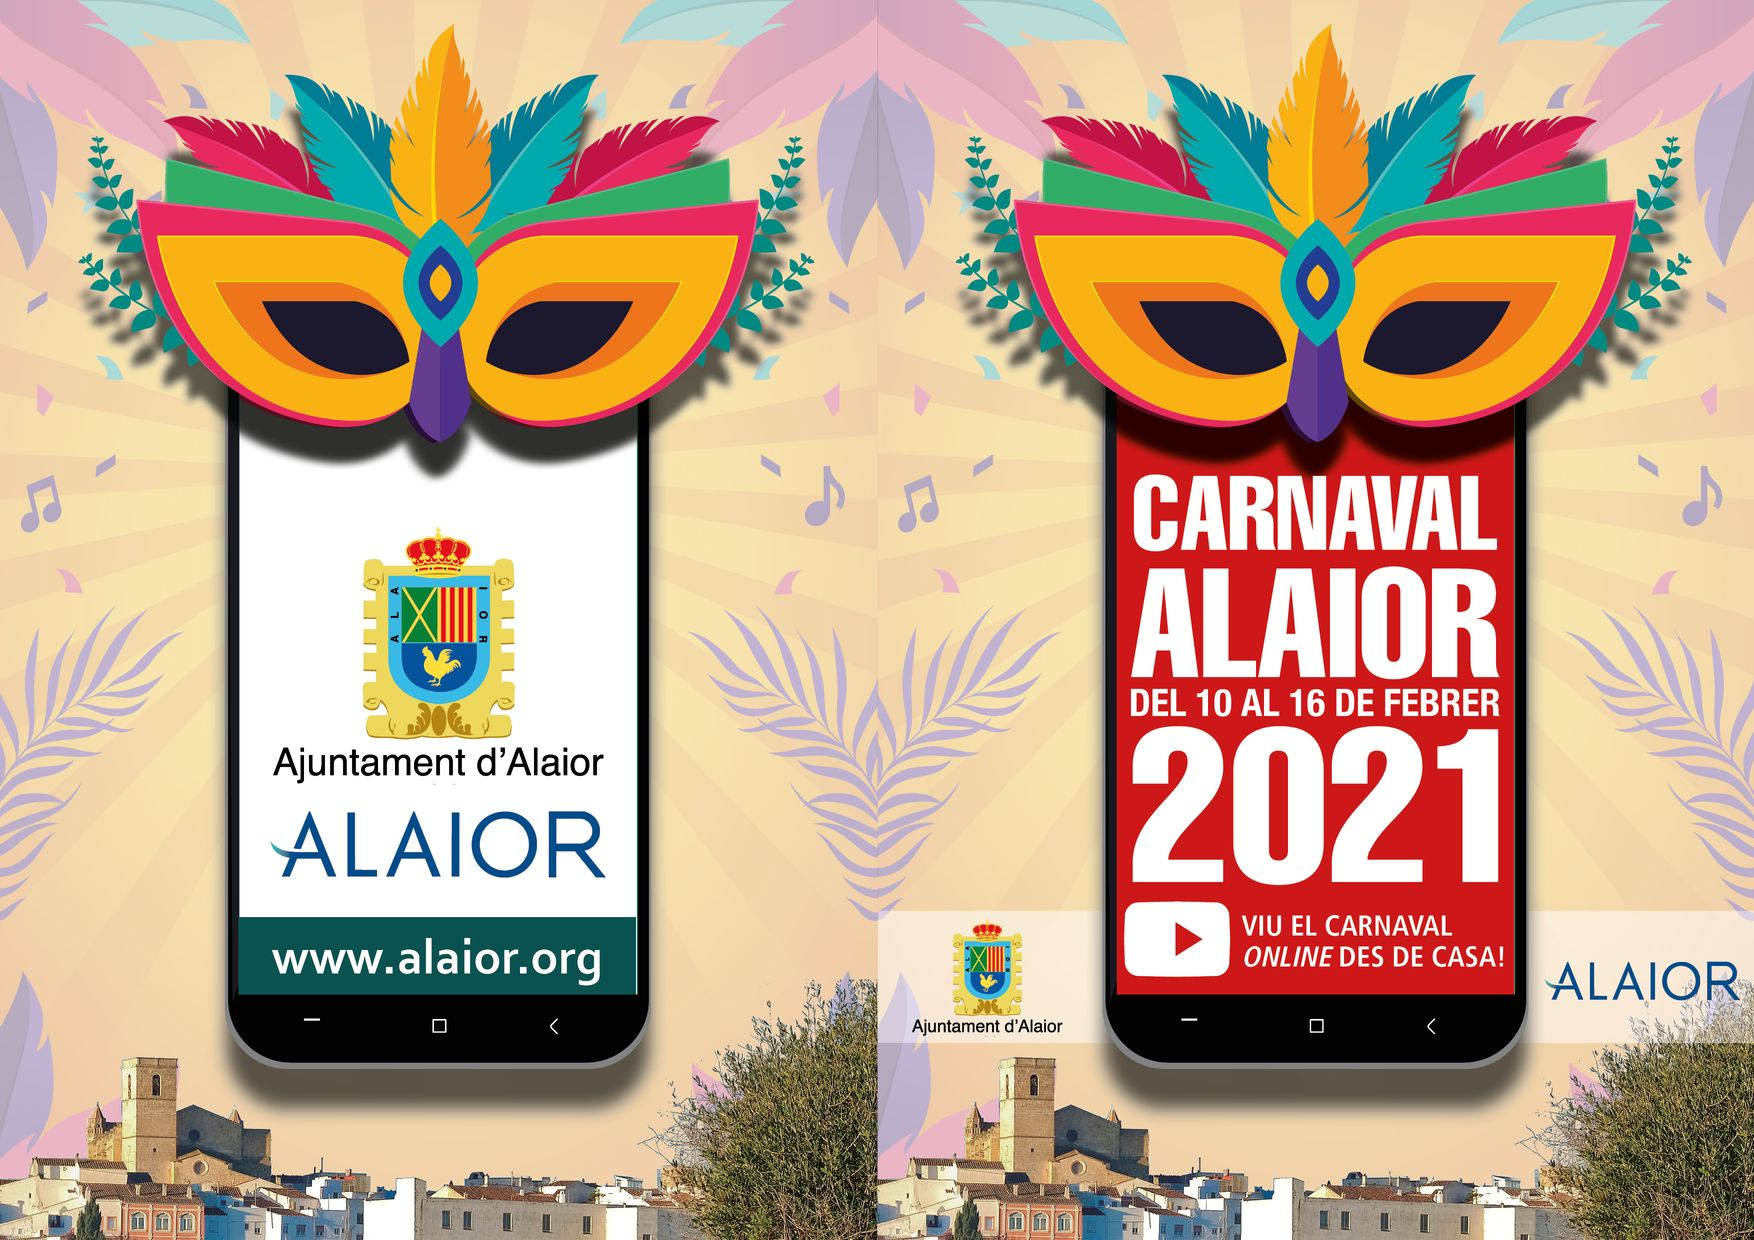 Carnaval Alaior 2021